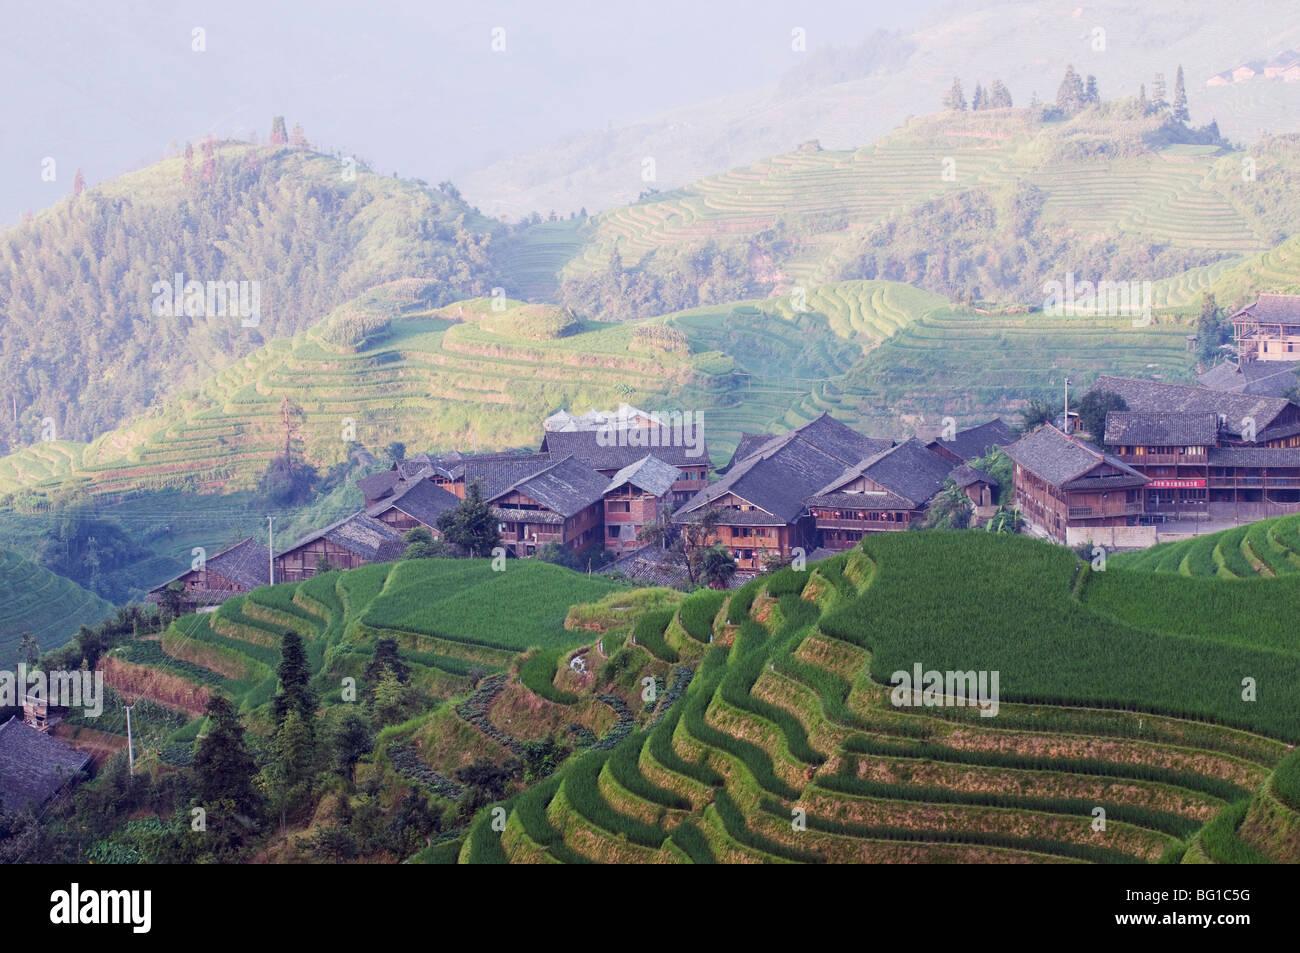 Dragons Backbone rice terraces, Longsheng, Guangxi Province, China, Asia Stock Photo